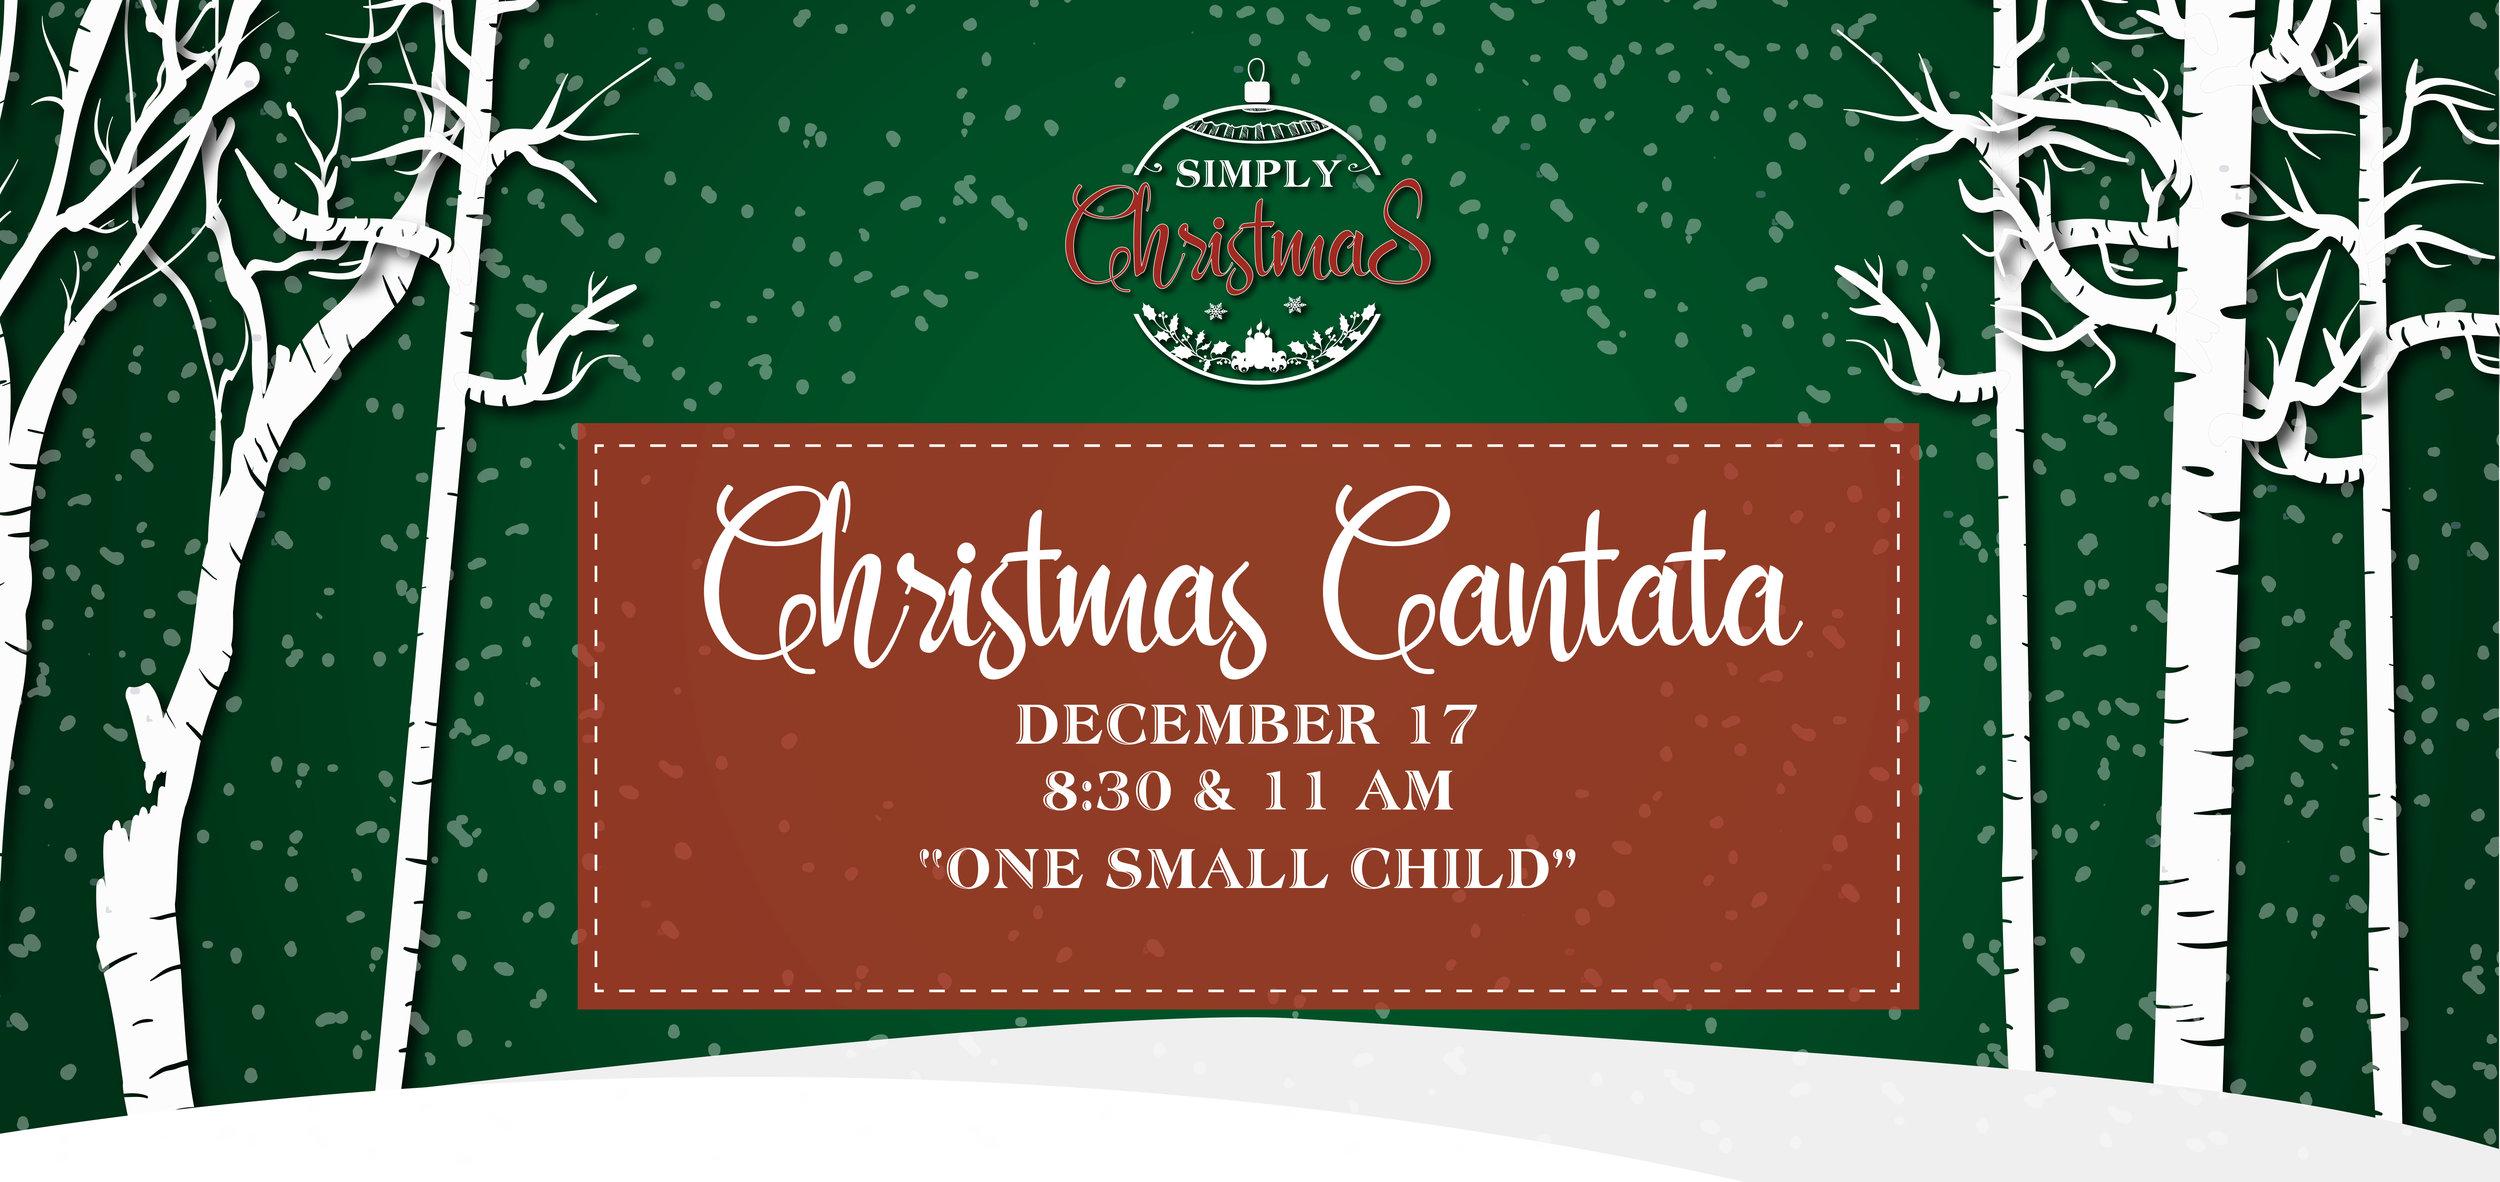 Christmas-17-Cantata.jpg